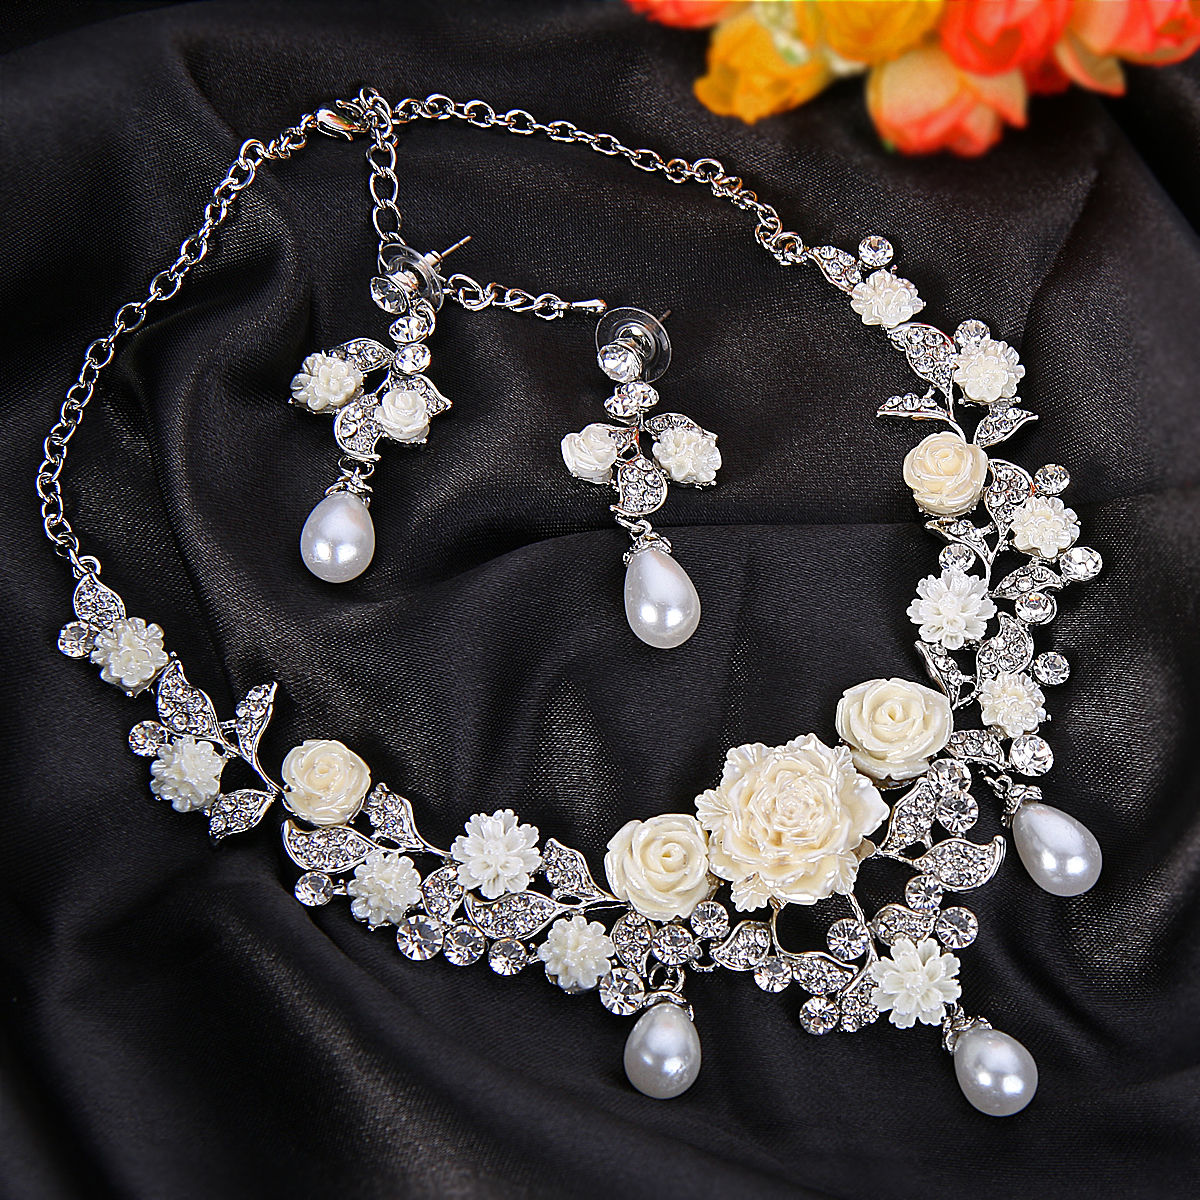 elegant rose necklace design